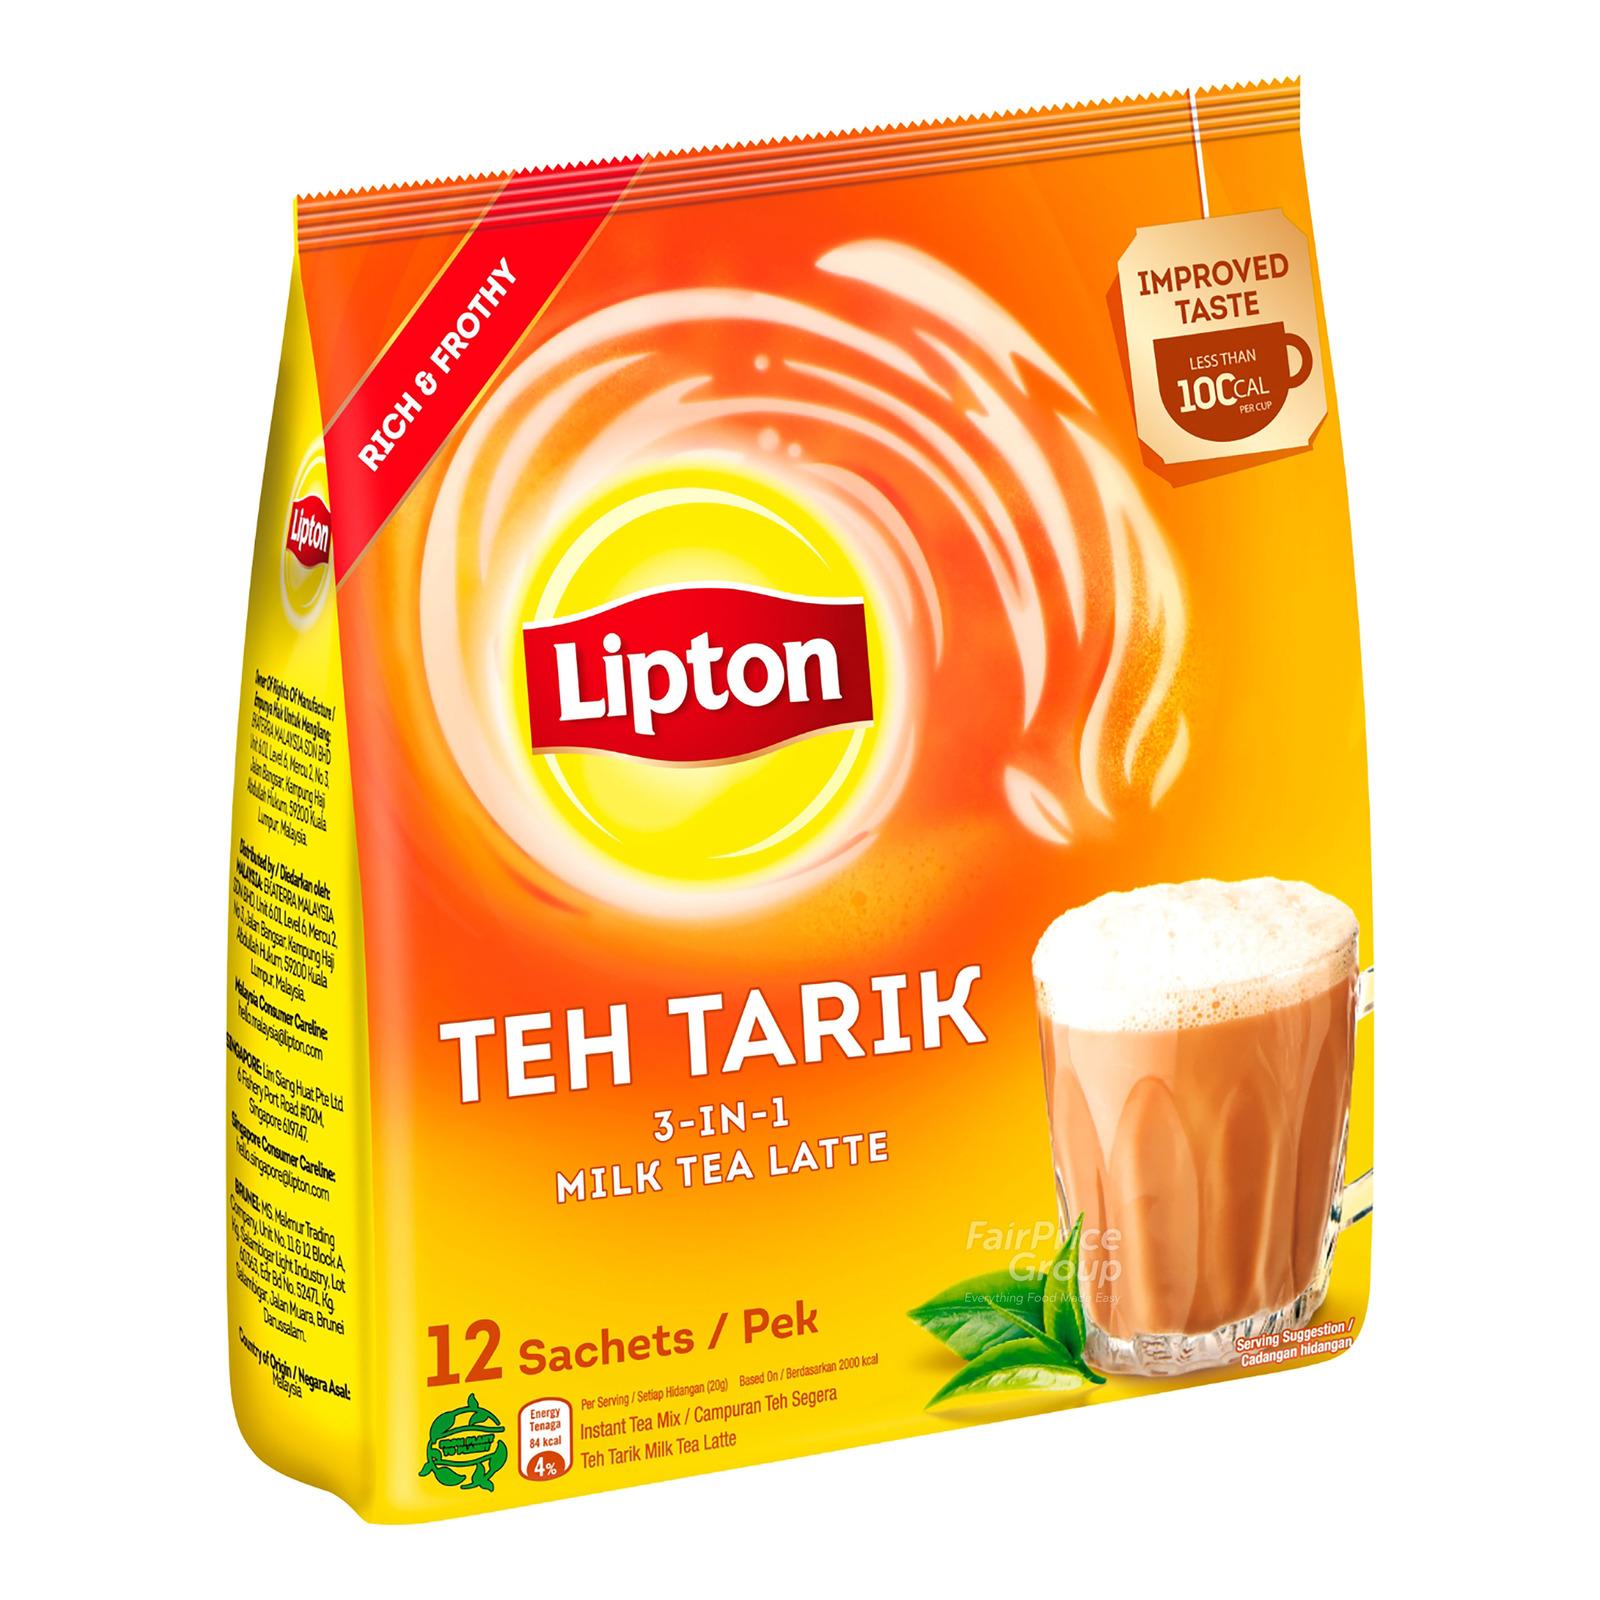 Lipton 3 in 1 Instant Milk Tea Latte - Teh Tarik